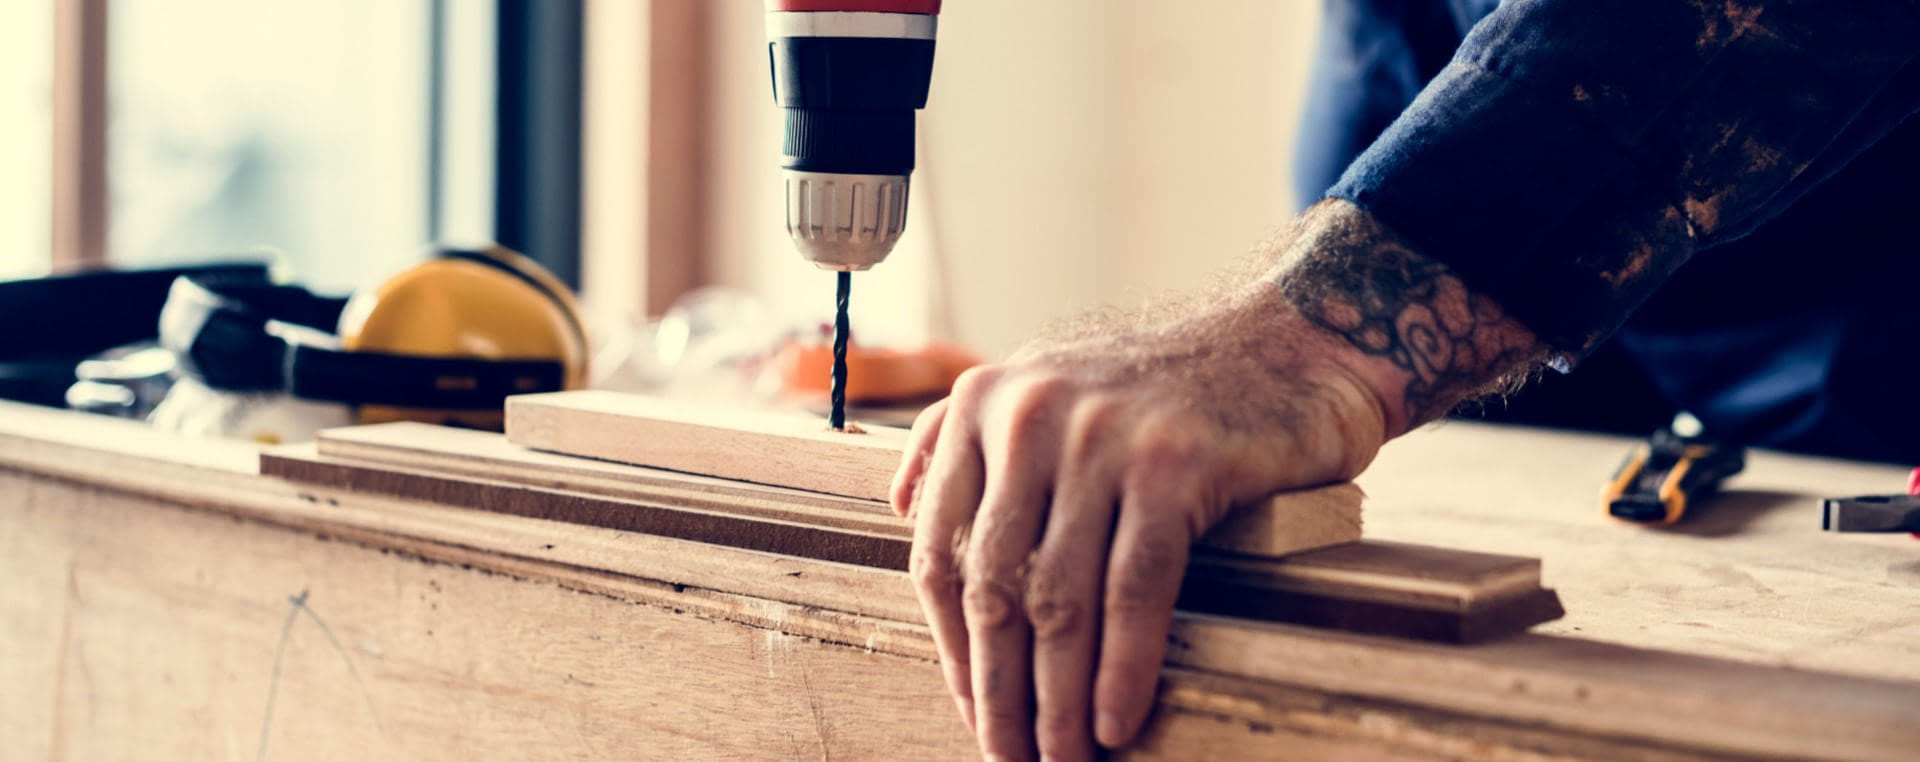 24/7 Handyman Service - Handyman Services in Naxxar, Malta